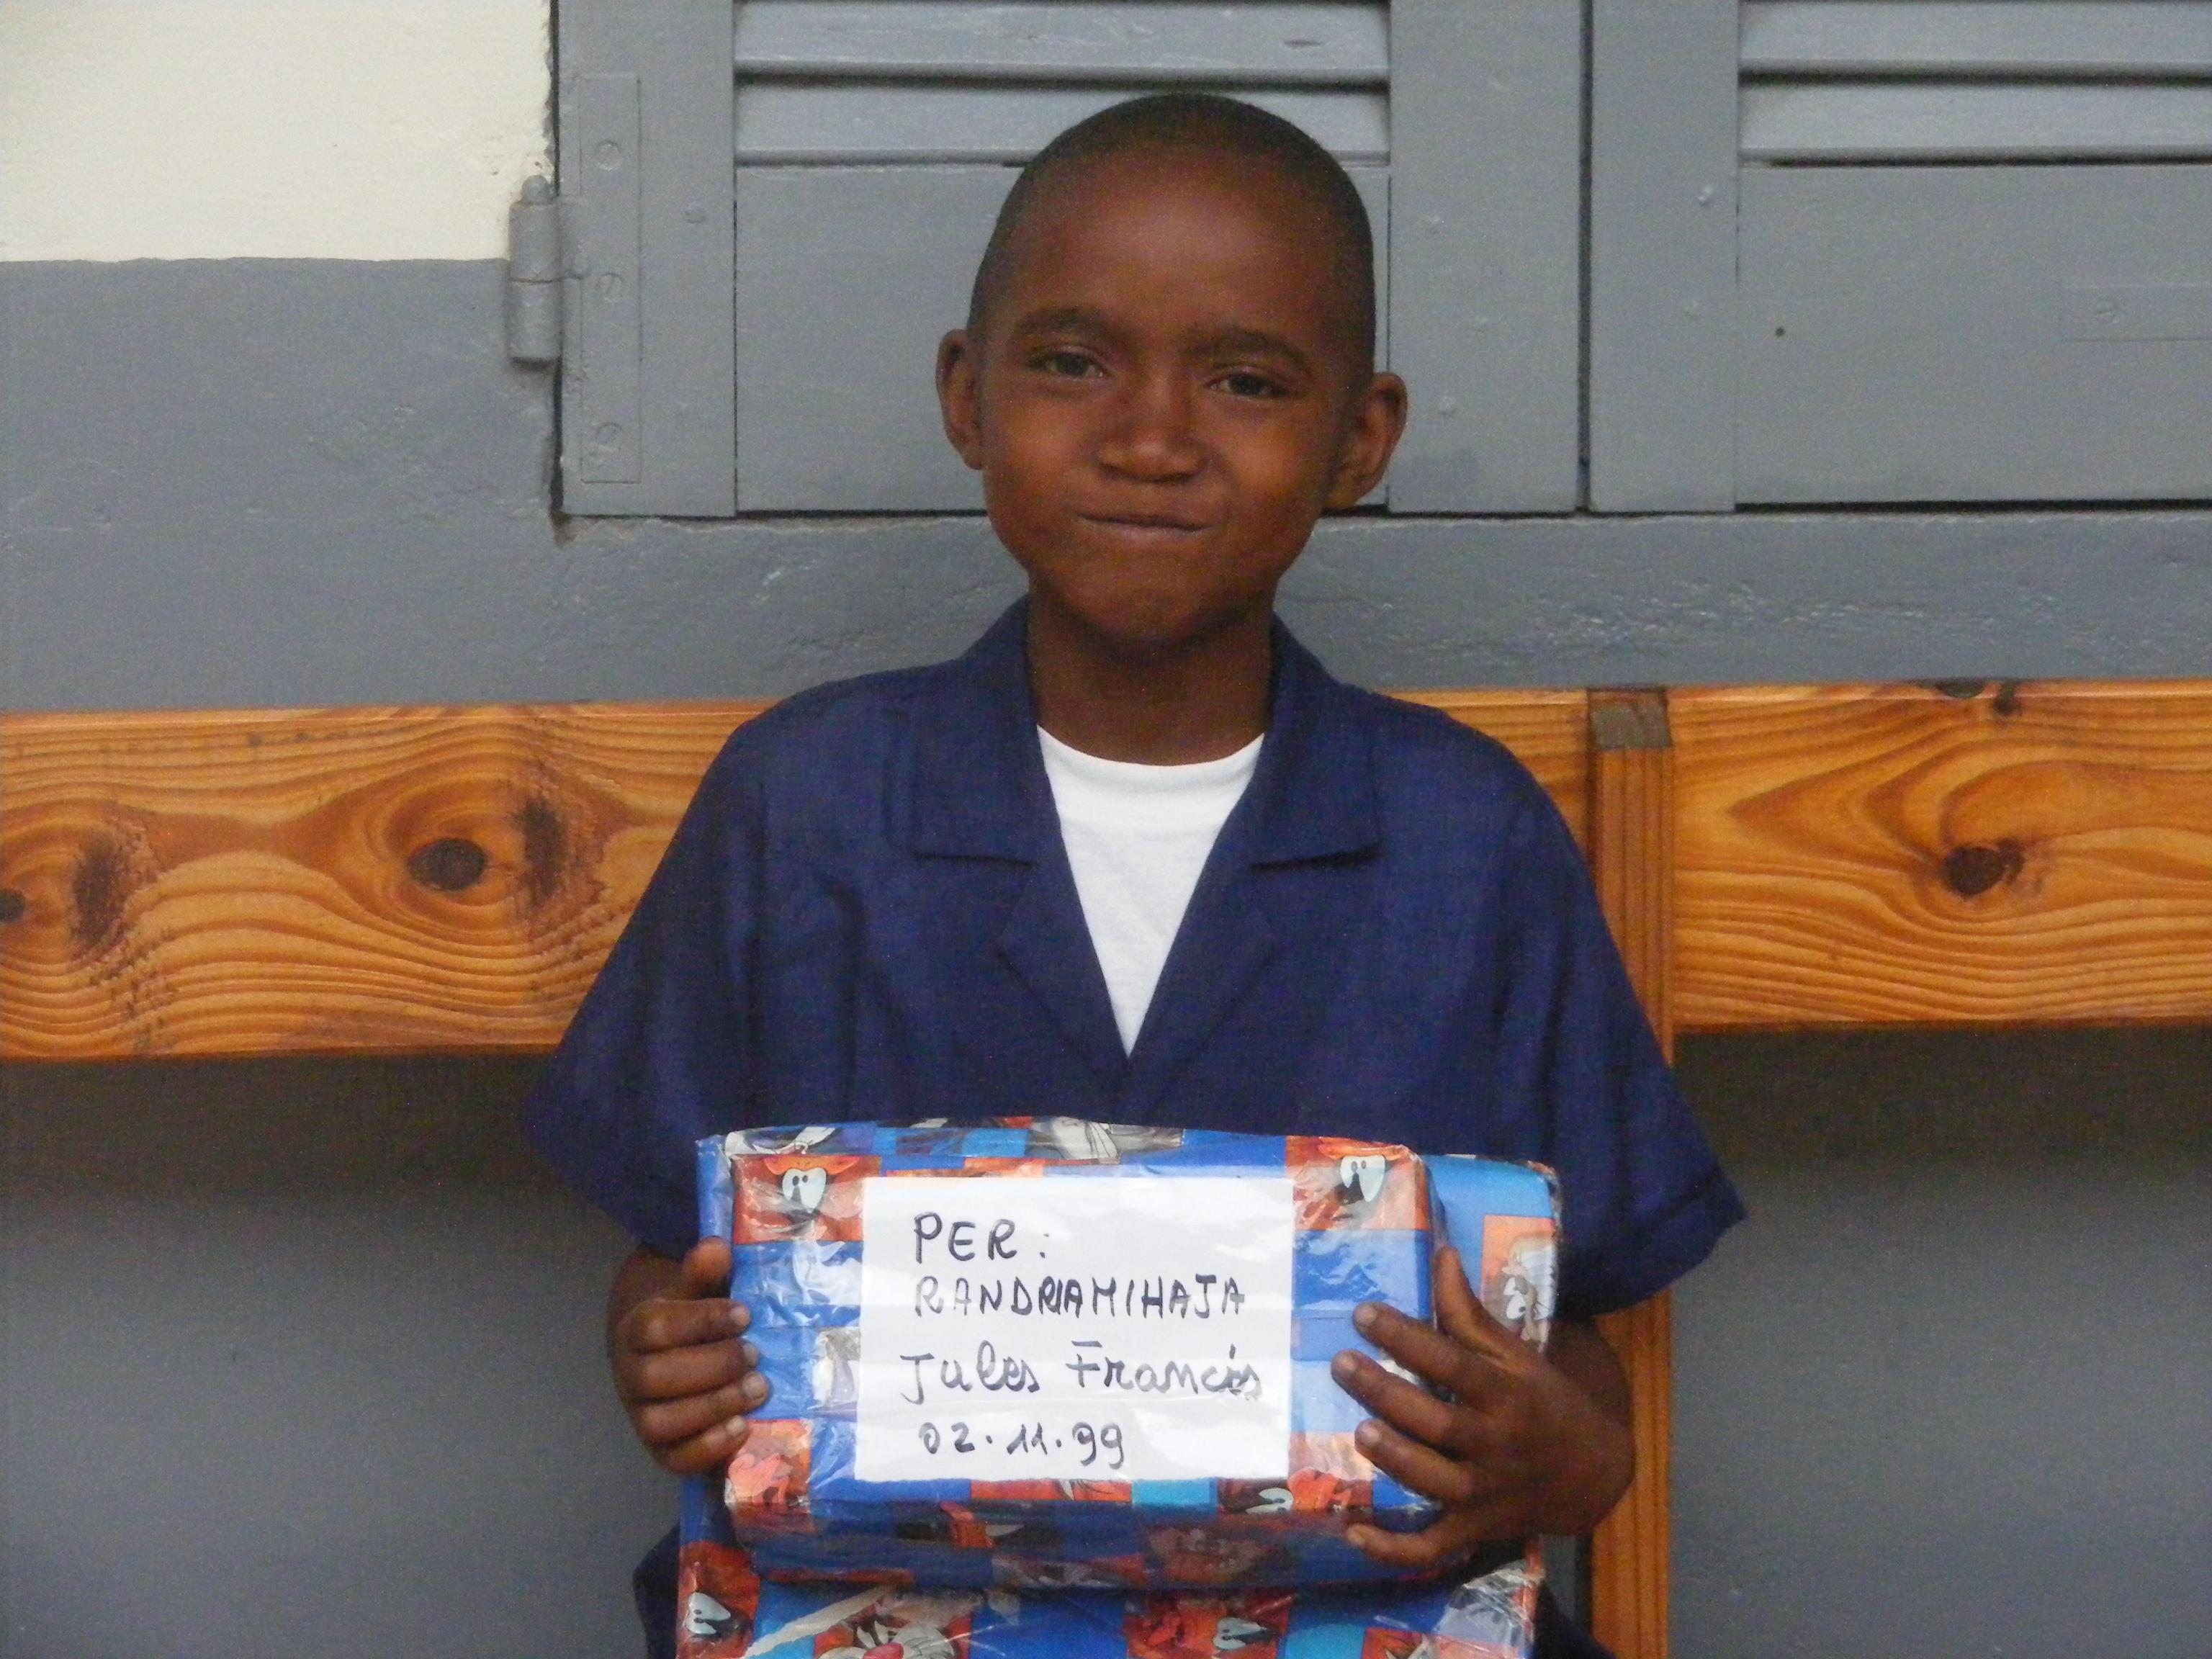 Un bambino adottato a distanza riceve un regalo dall'Italia (Manakara, Madagascar, 2008)